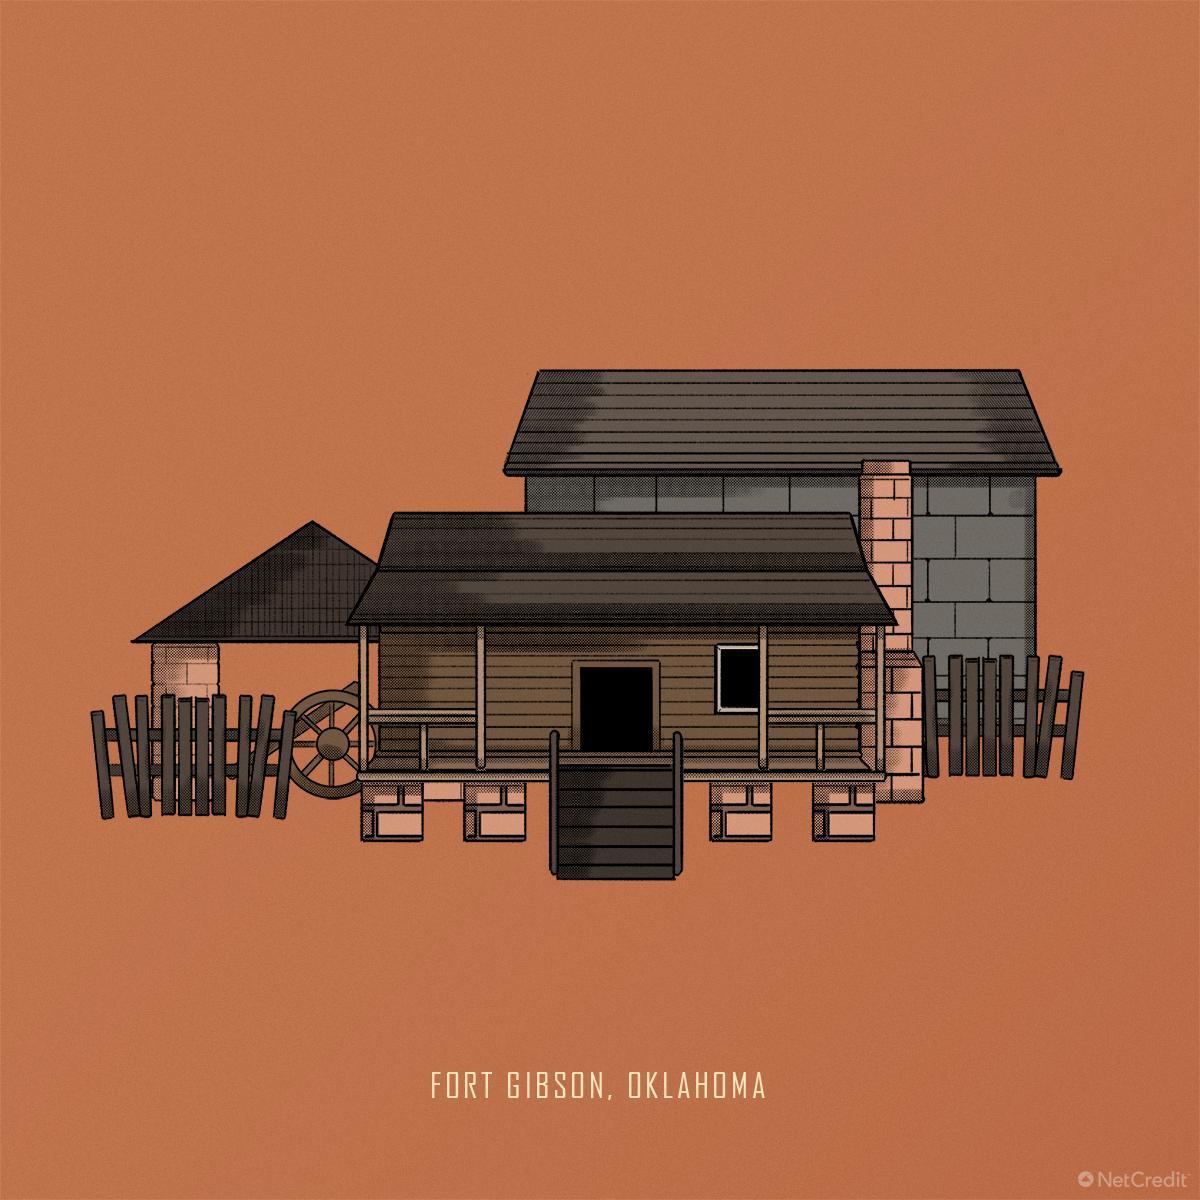 Fort Gibson, Oklahoma